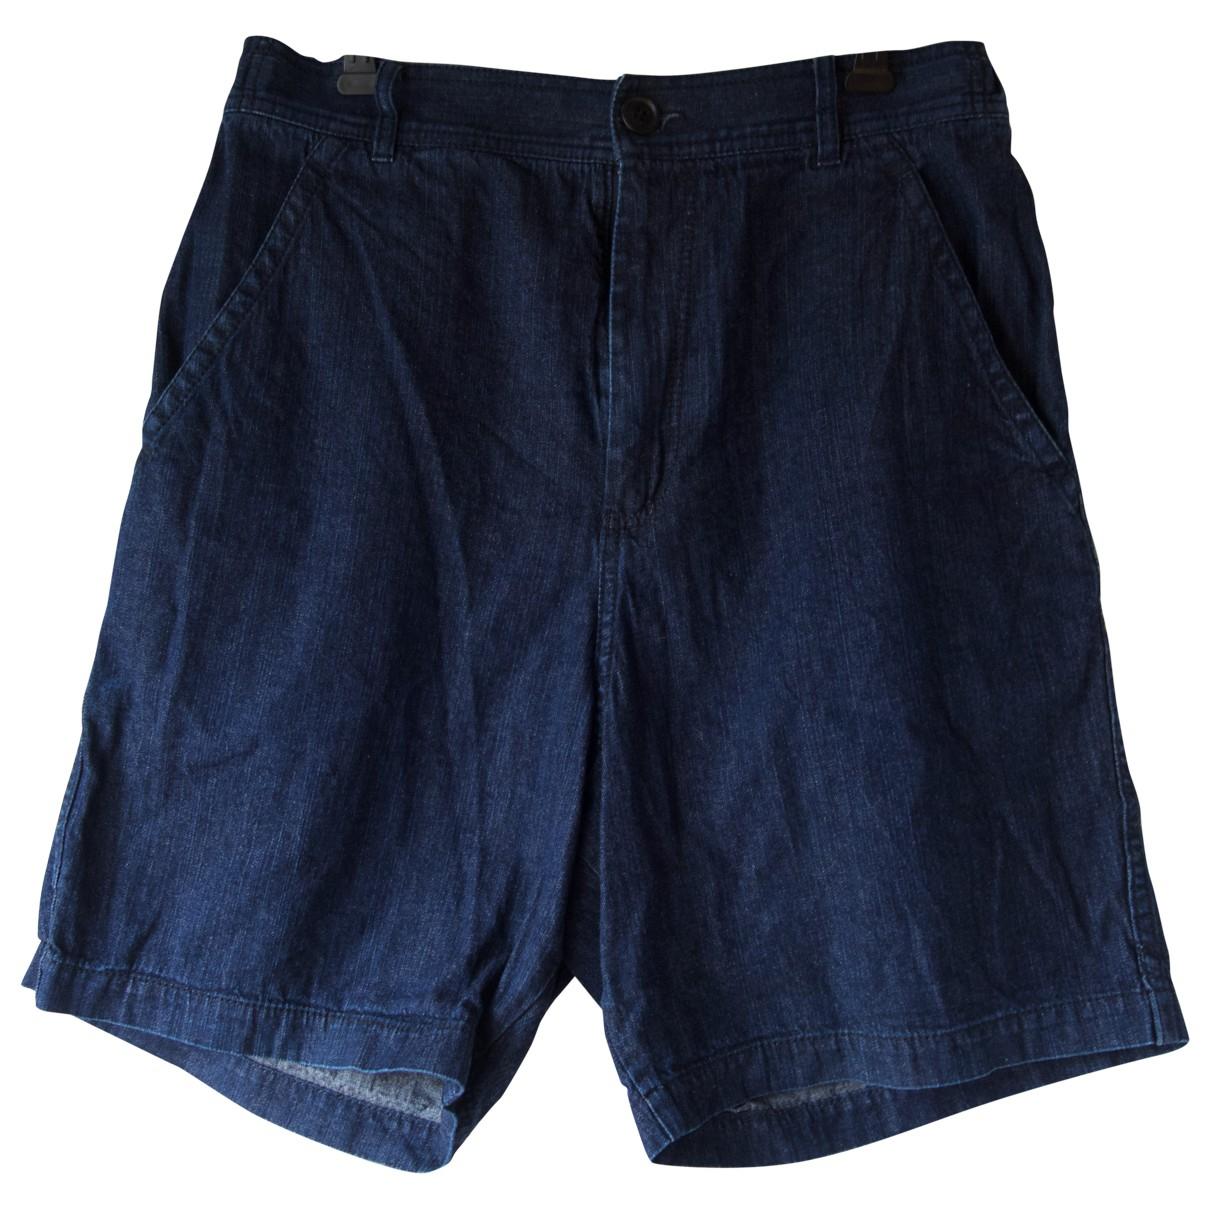 Comme Des Garcons \N Shorts in  Marine Denim - Jeans